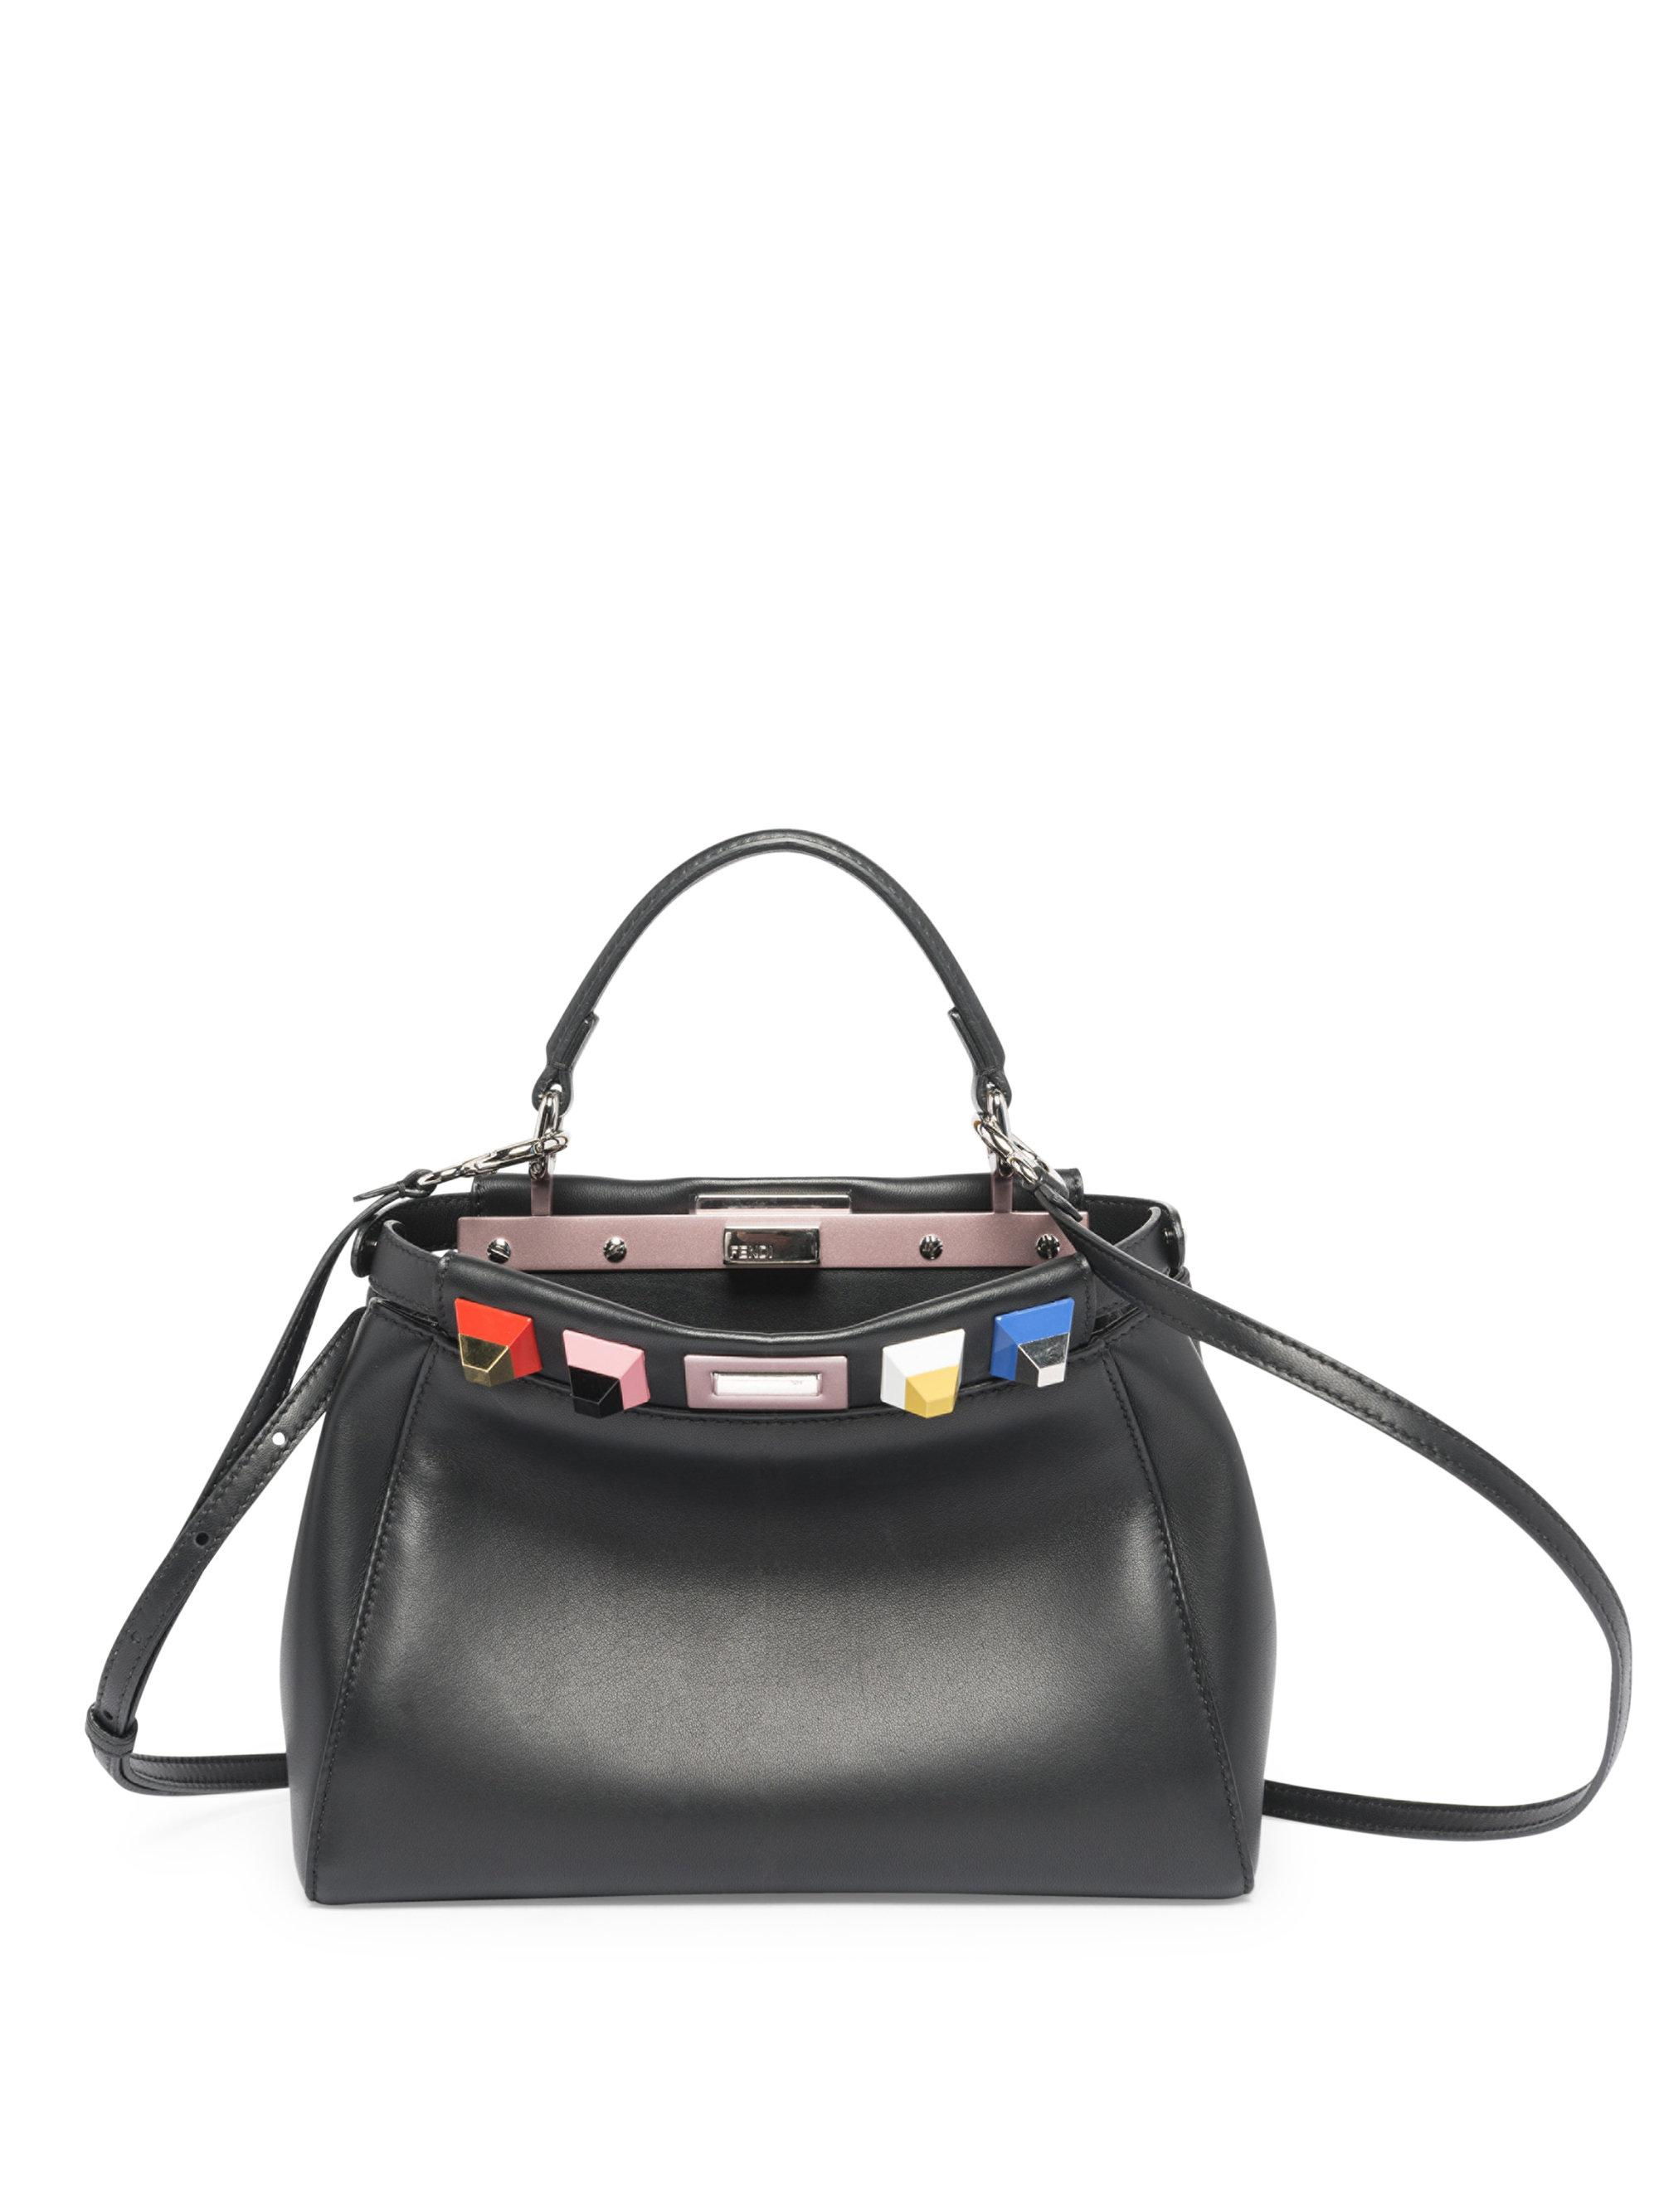 fcb5c301d858 Lyst - Fendi Mini Peekaboo Rainbow Studded Leather Satchel in Black